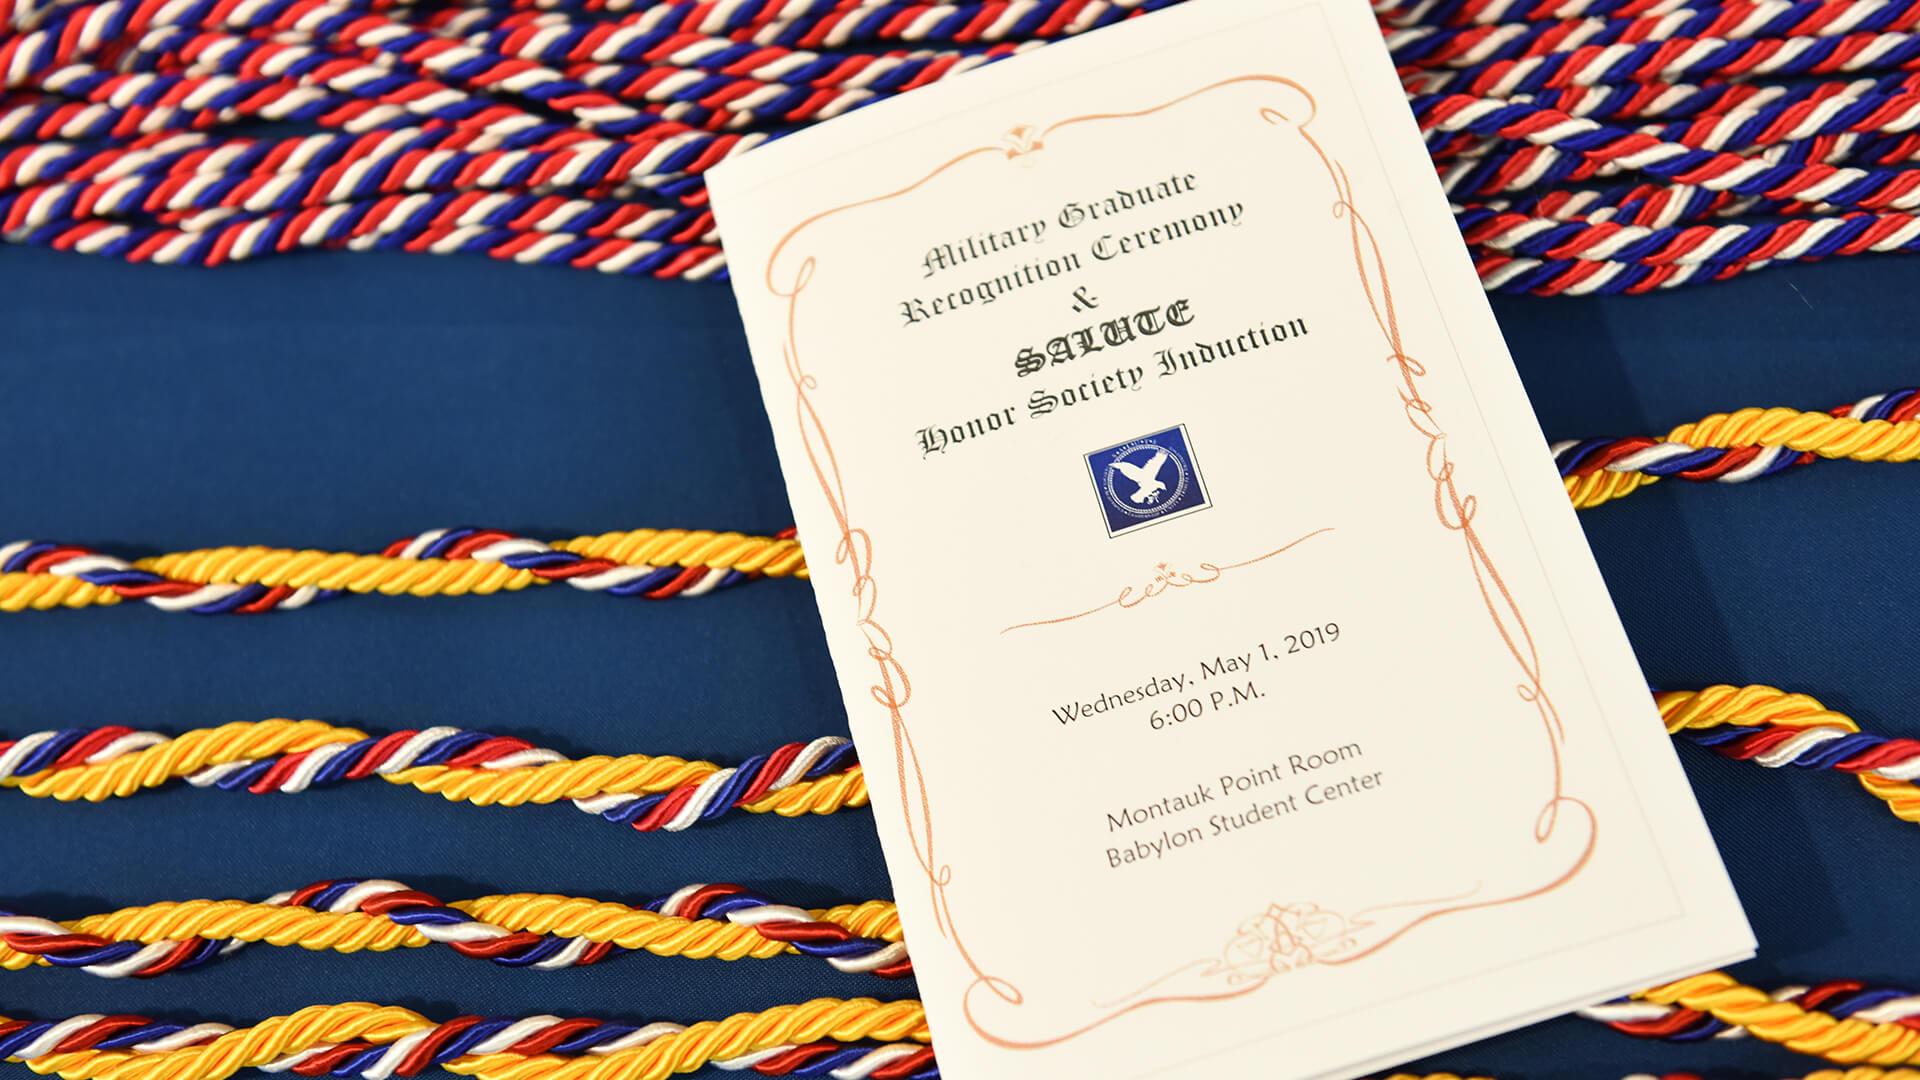 Military Graduate Ceremony Pamphlet